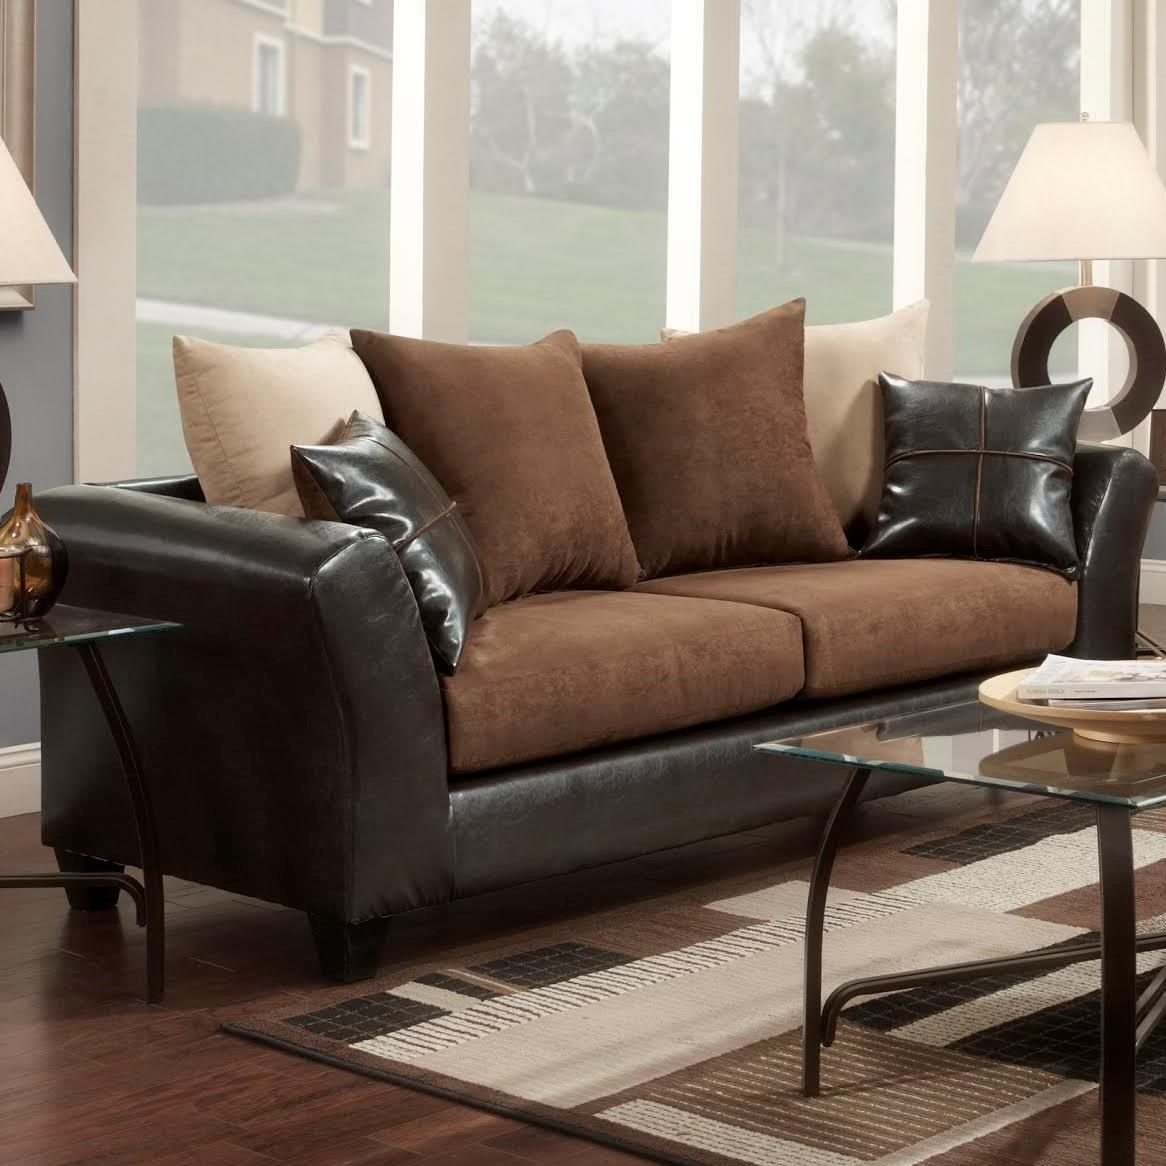 Washington Furniture 9000 Sofa - Item Number: 9000 Sofa Flatsuede Chocolate